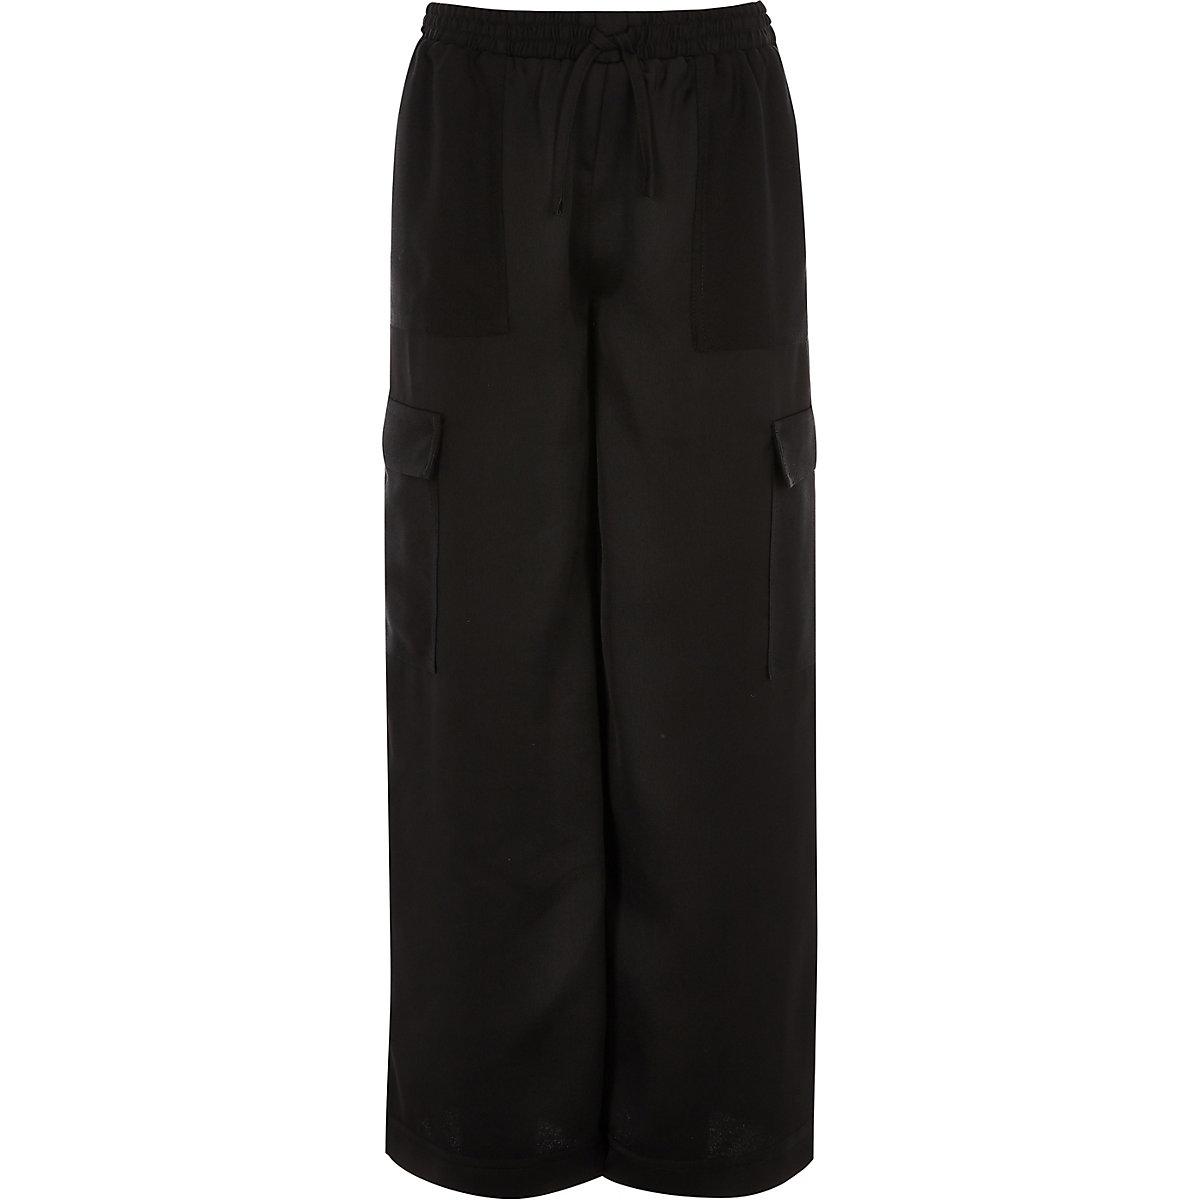 Girls black wide leg cargo pants